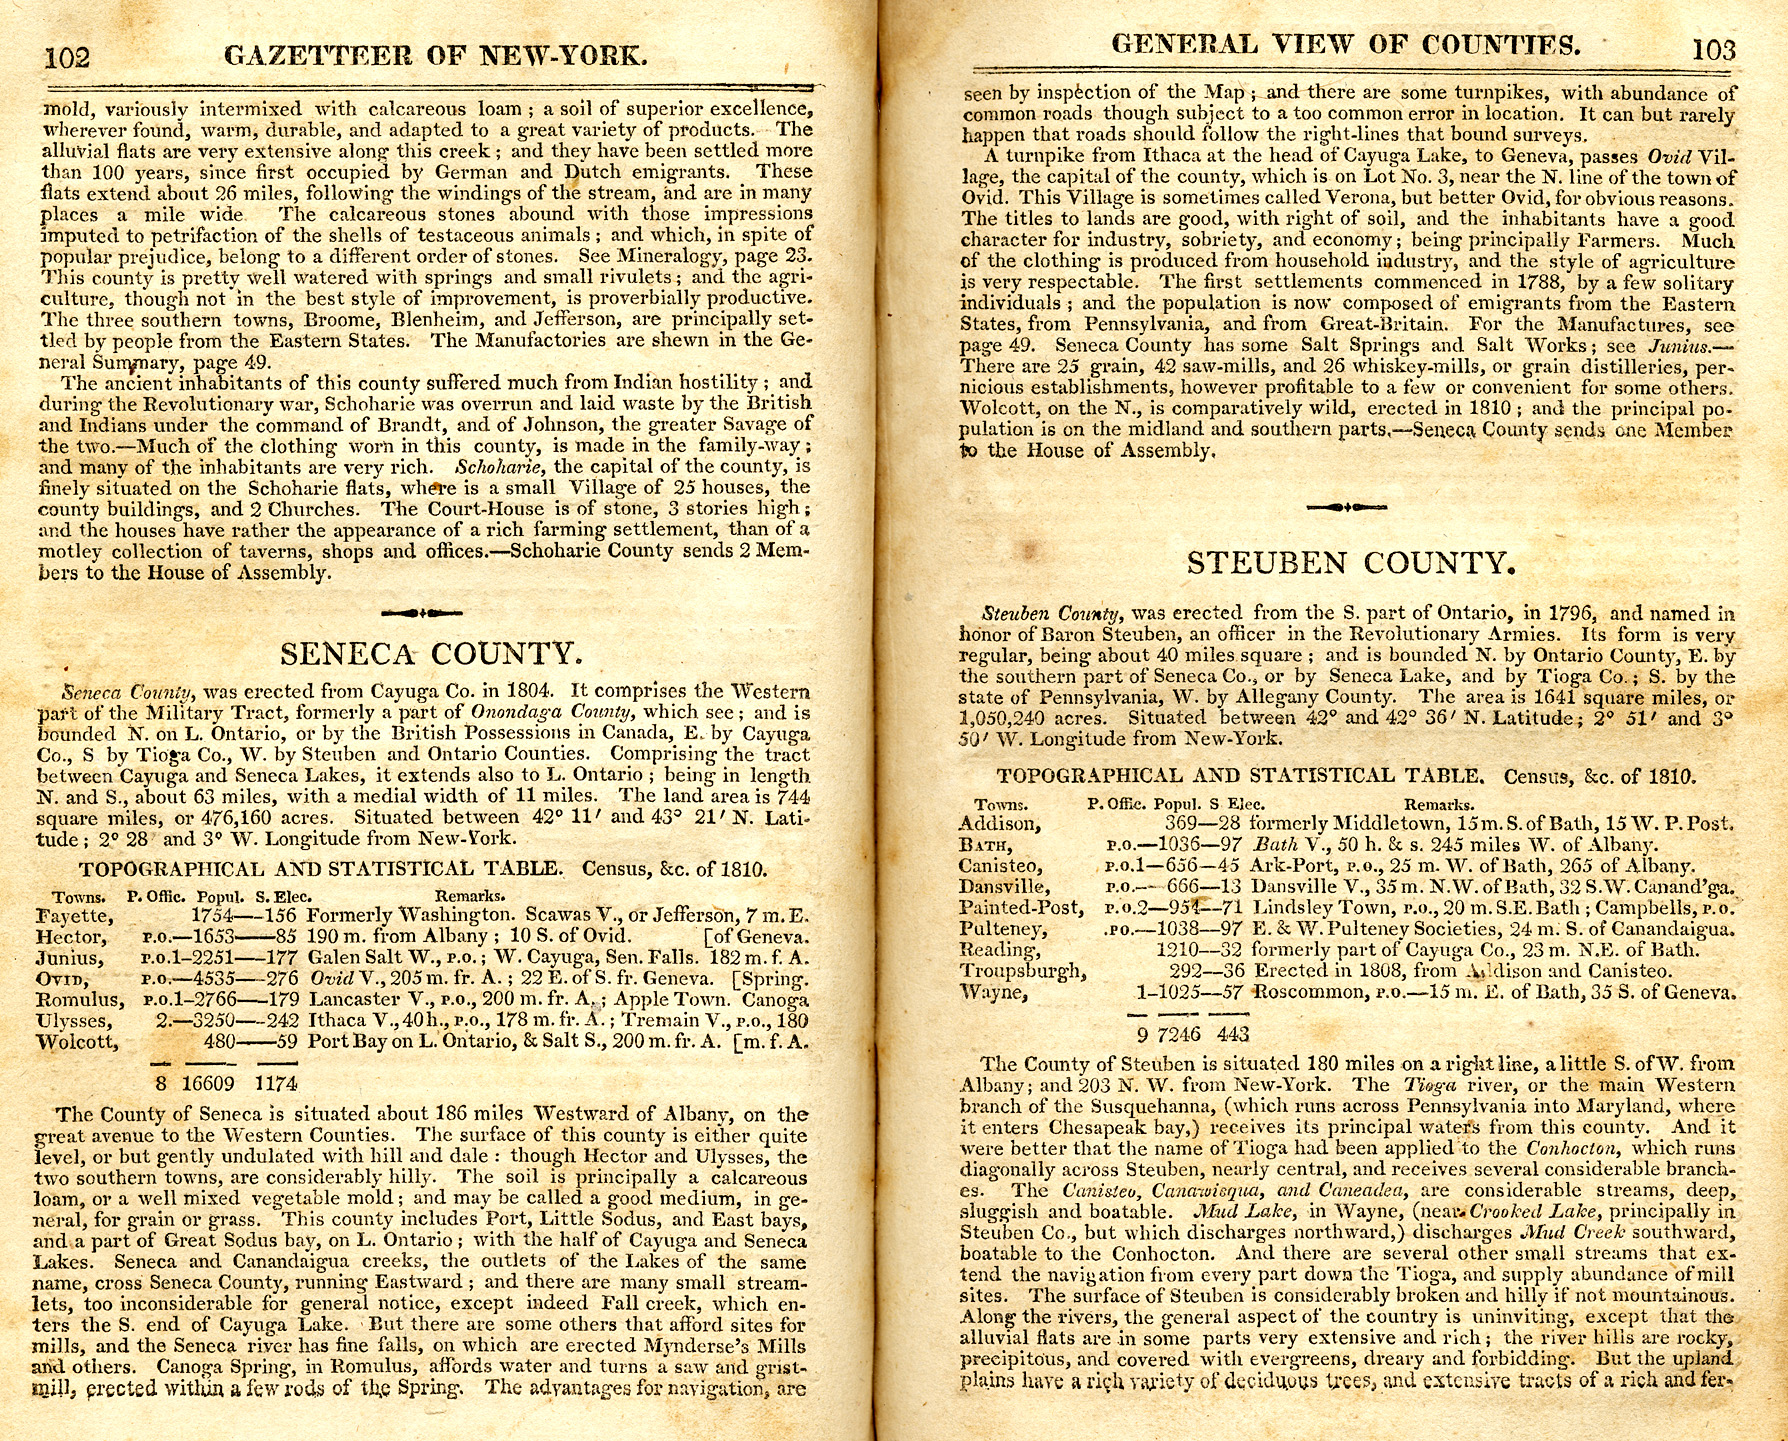 New york cayuga county -  1813 Gazetteer Of New York Page 102 103 Seneca Co Info